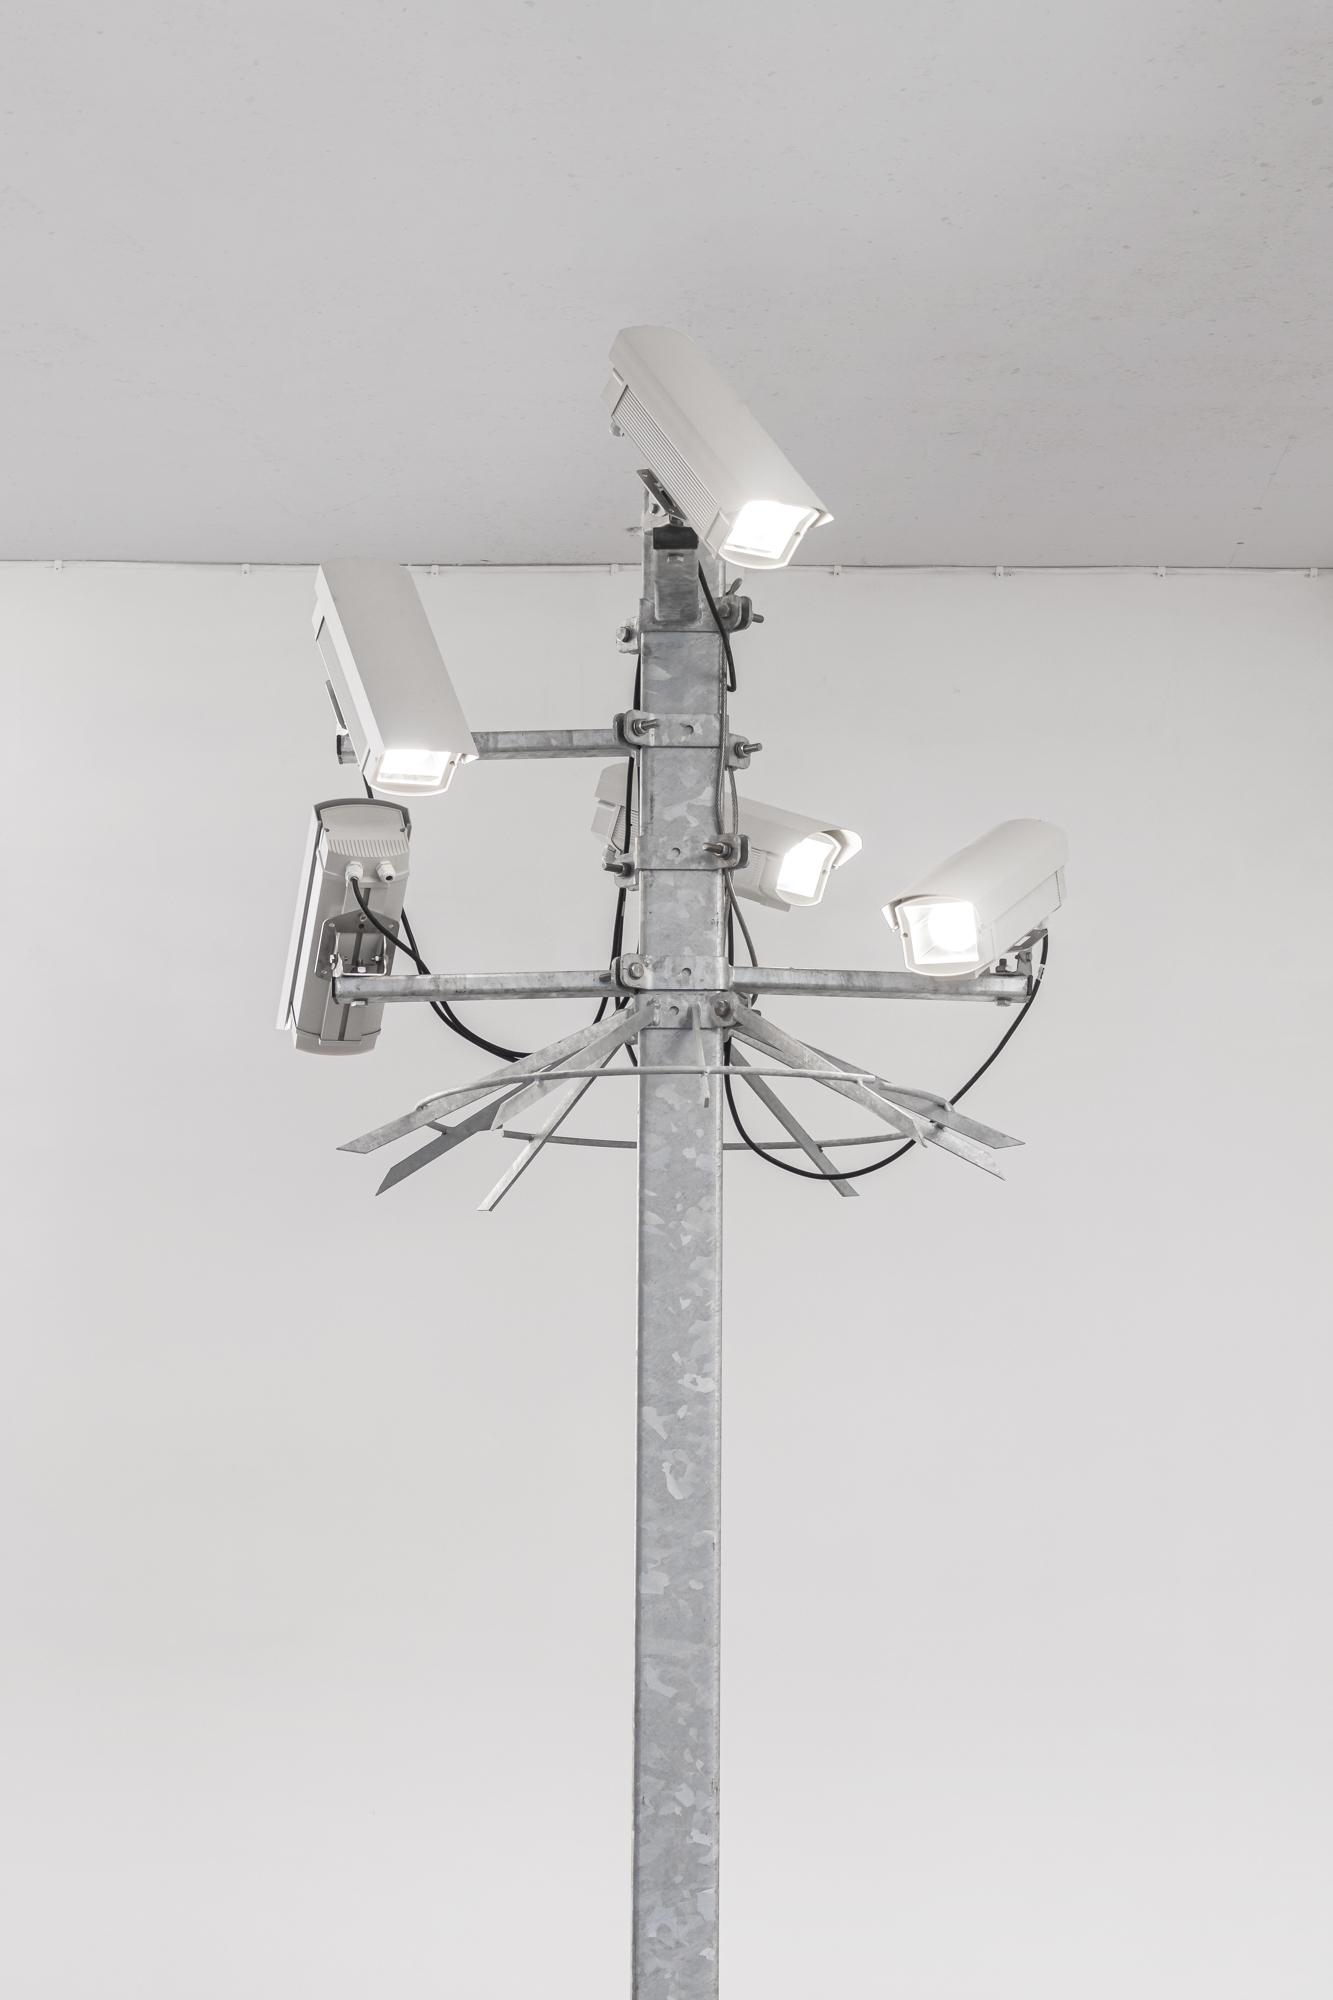 surveillance_001_web.jpg